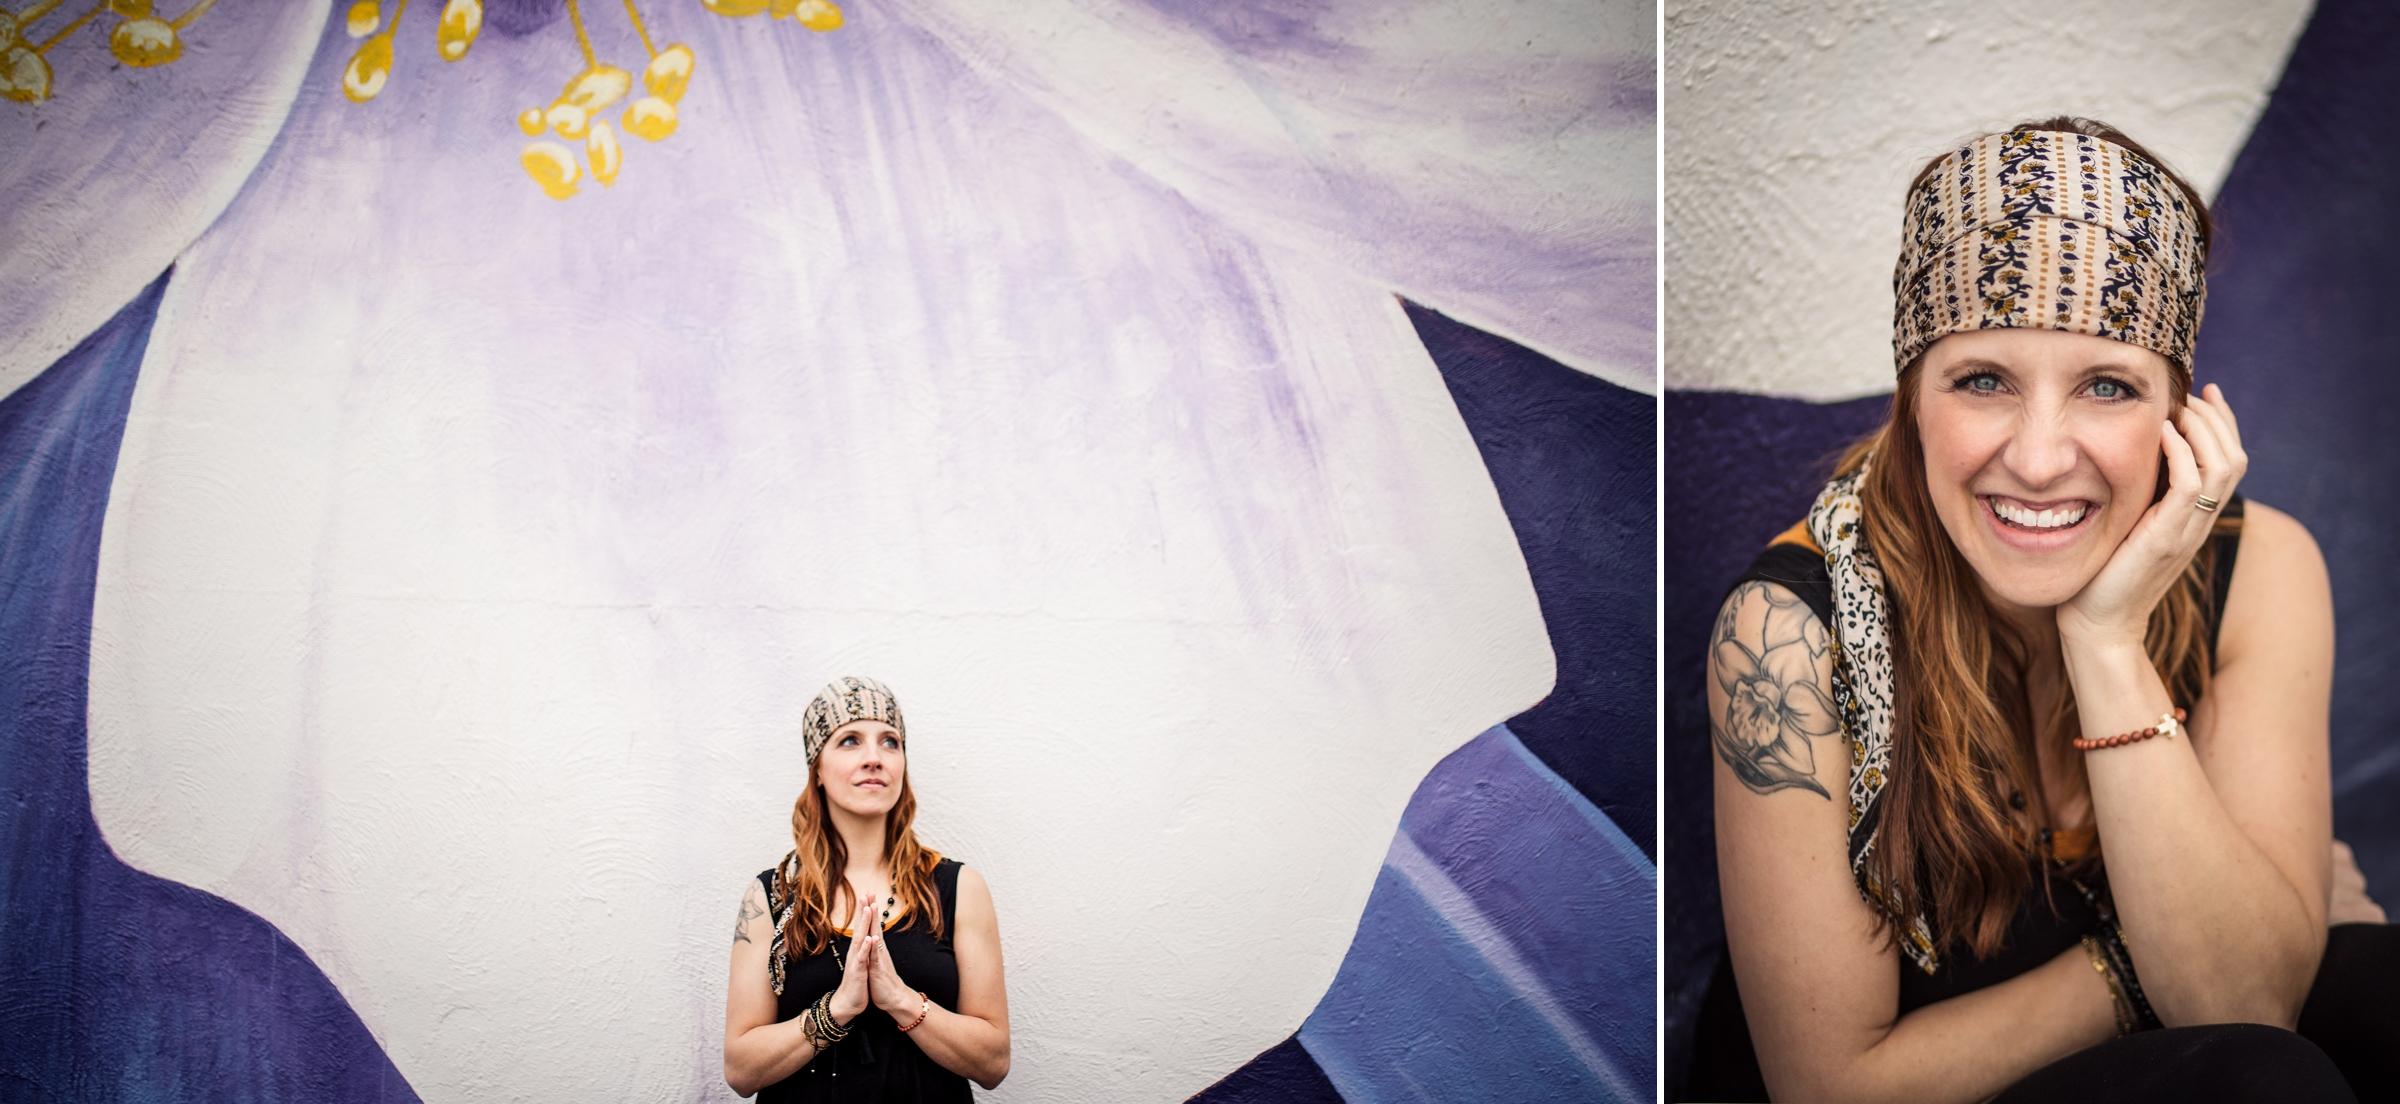 creative headshot photographer, environmental portraits